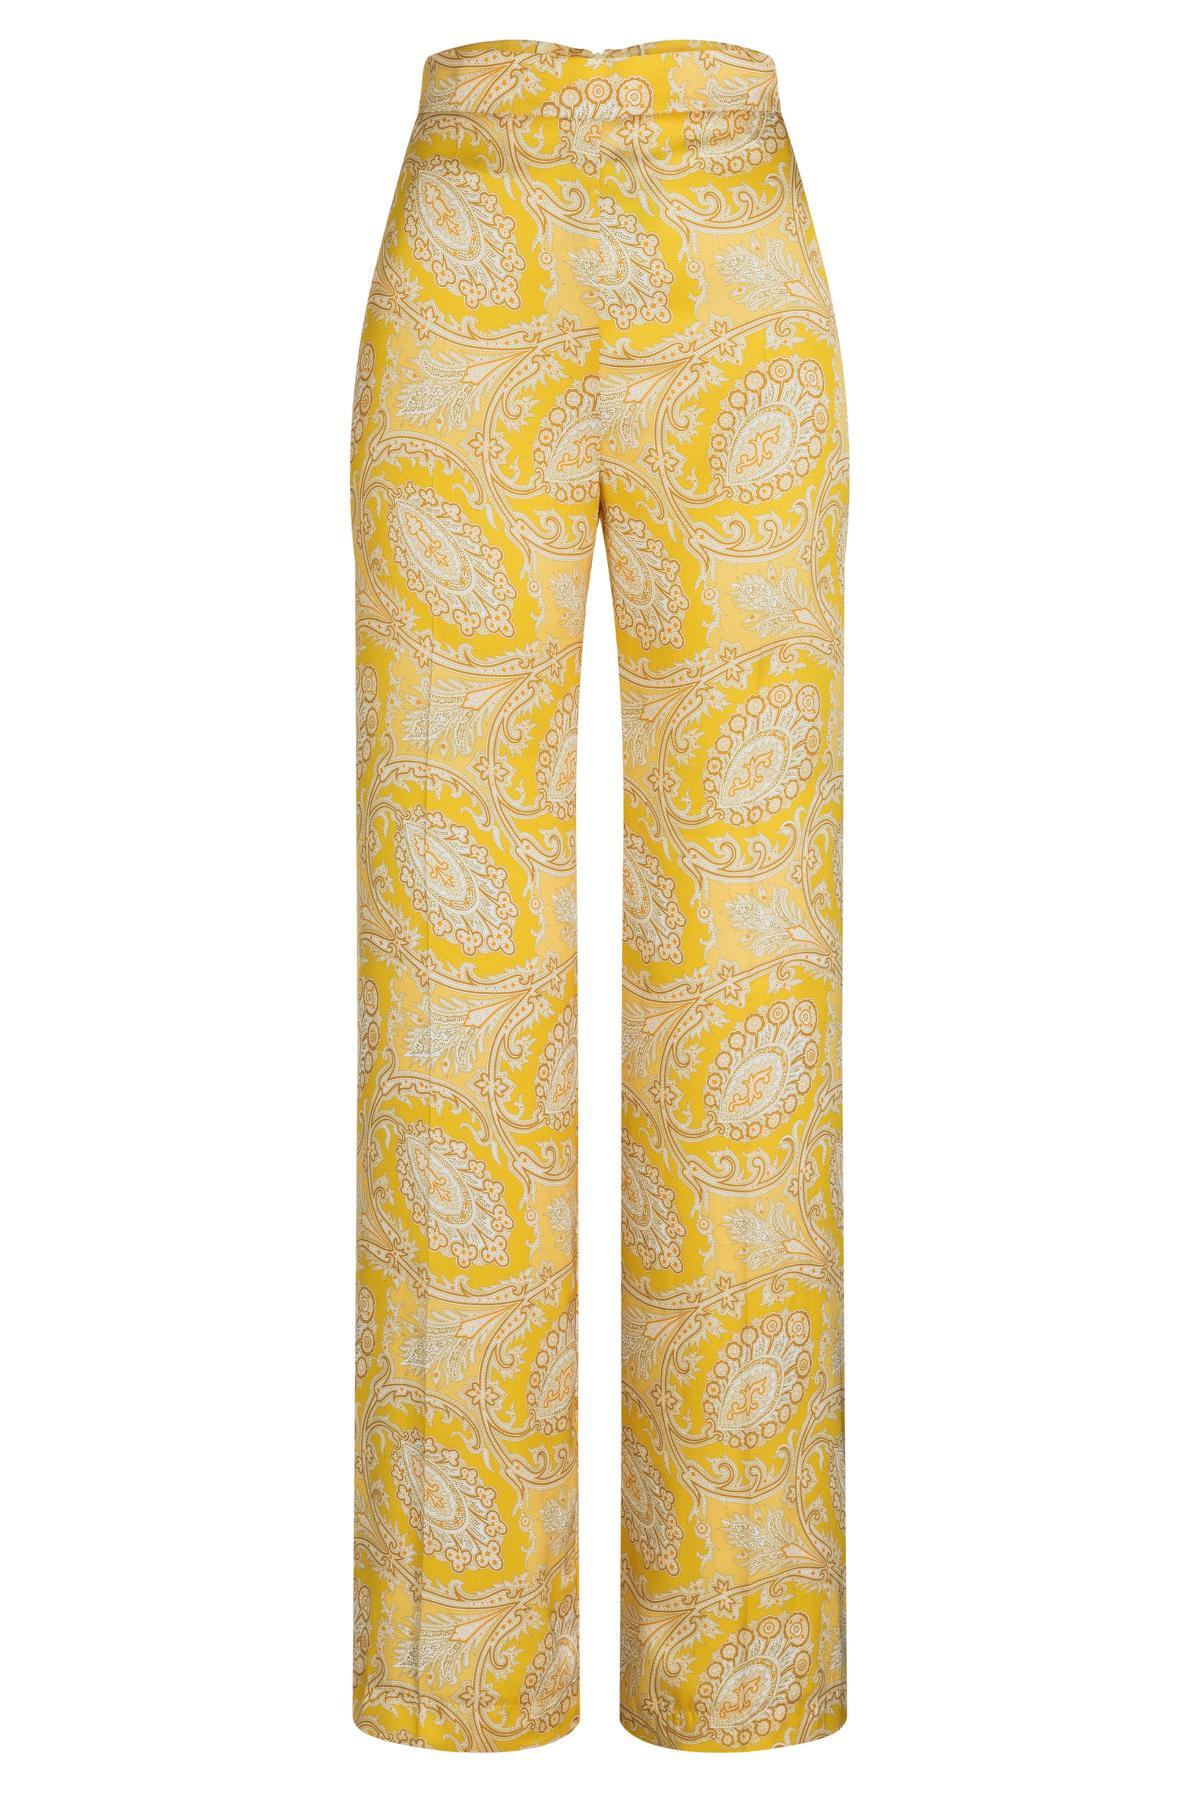 Ana Alcazar Paisley Pant Tefnara Yellow